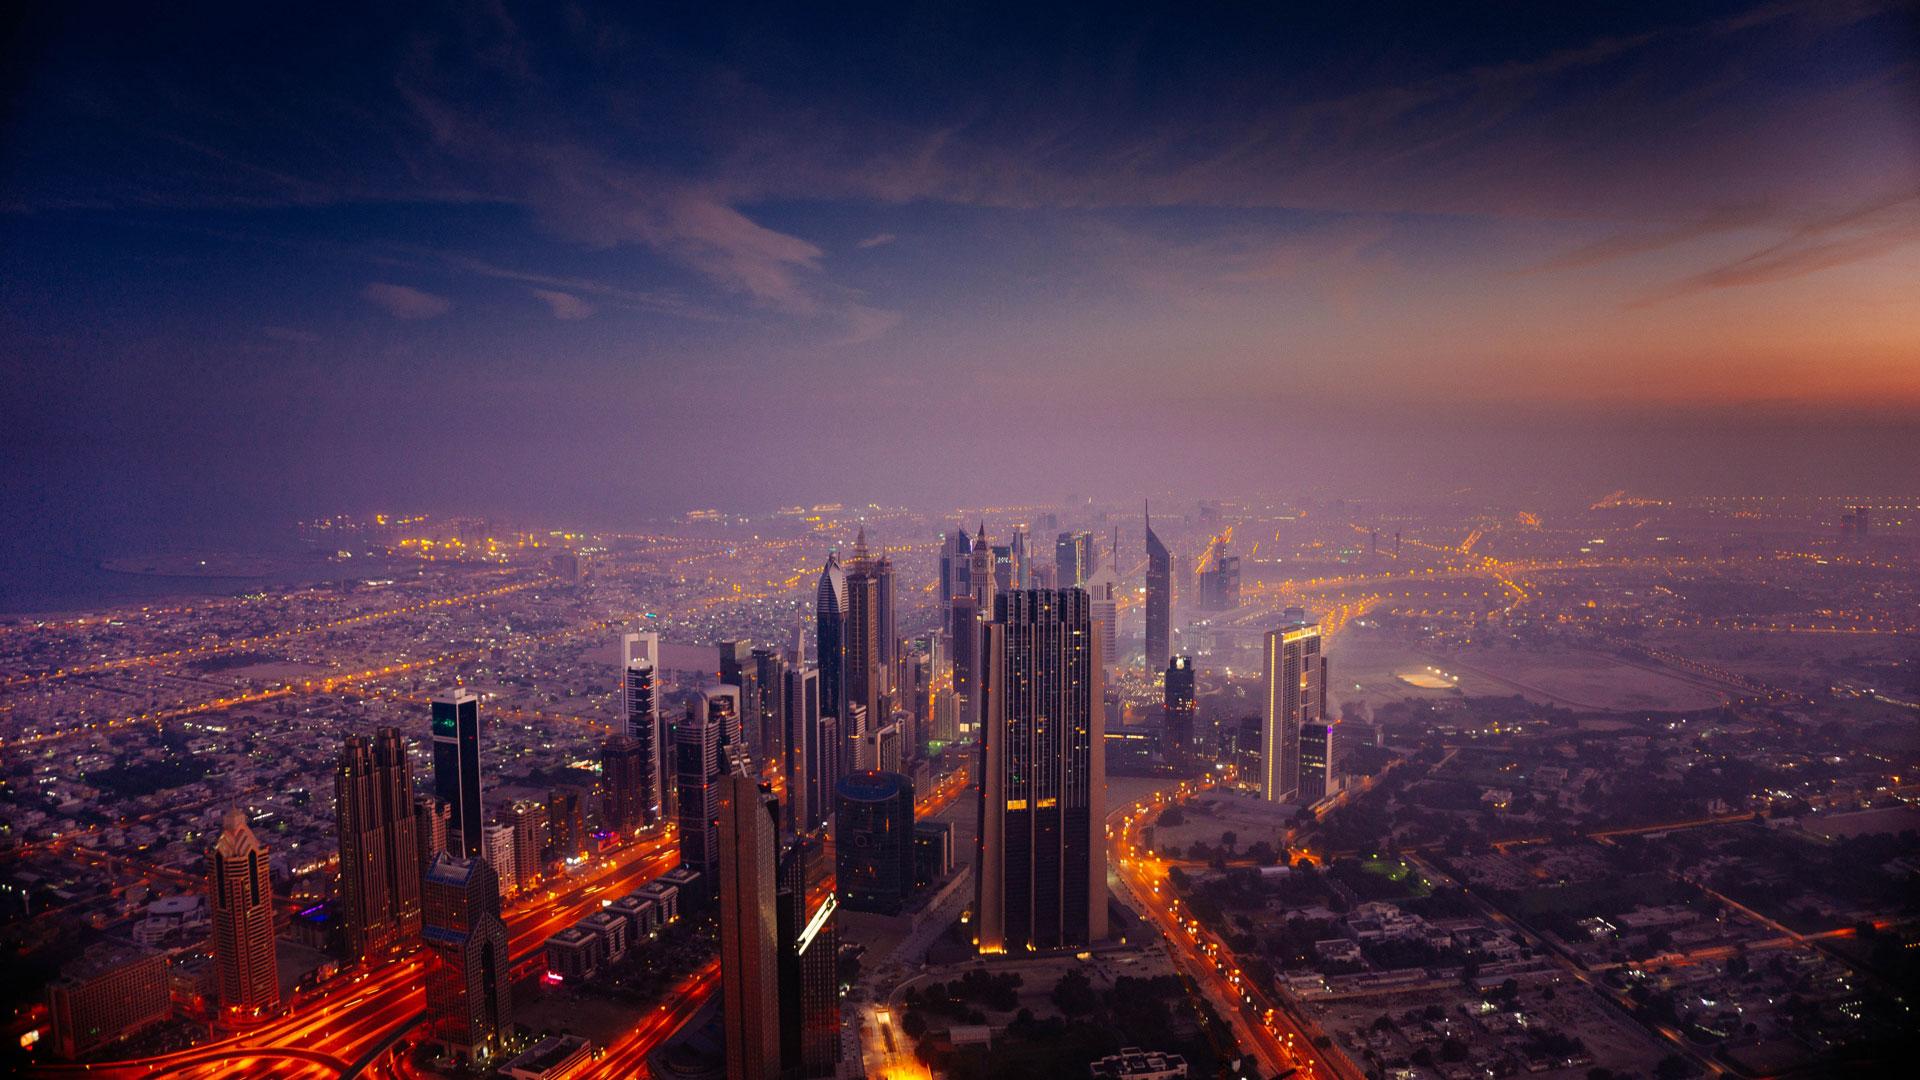 Dubai Skyline by Piotr Chrobot